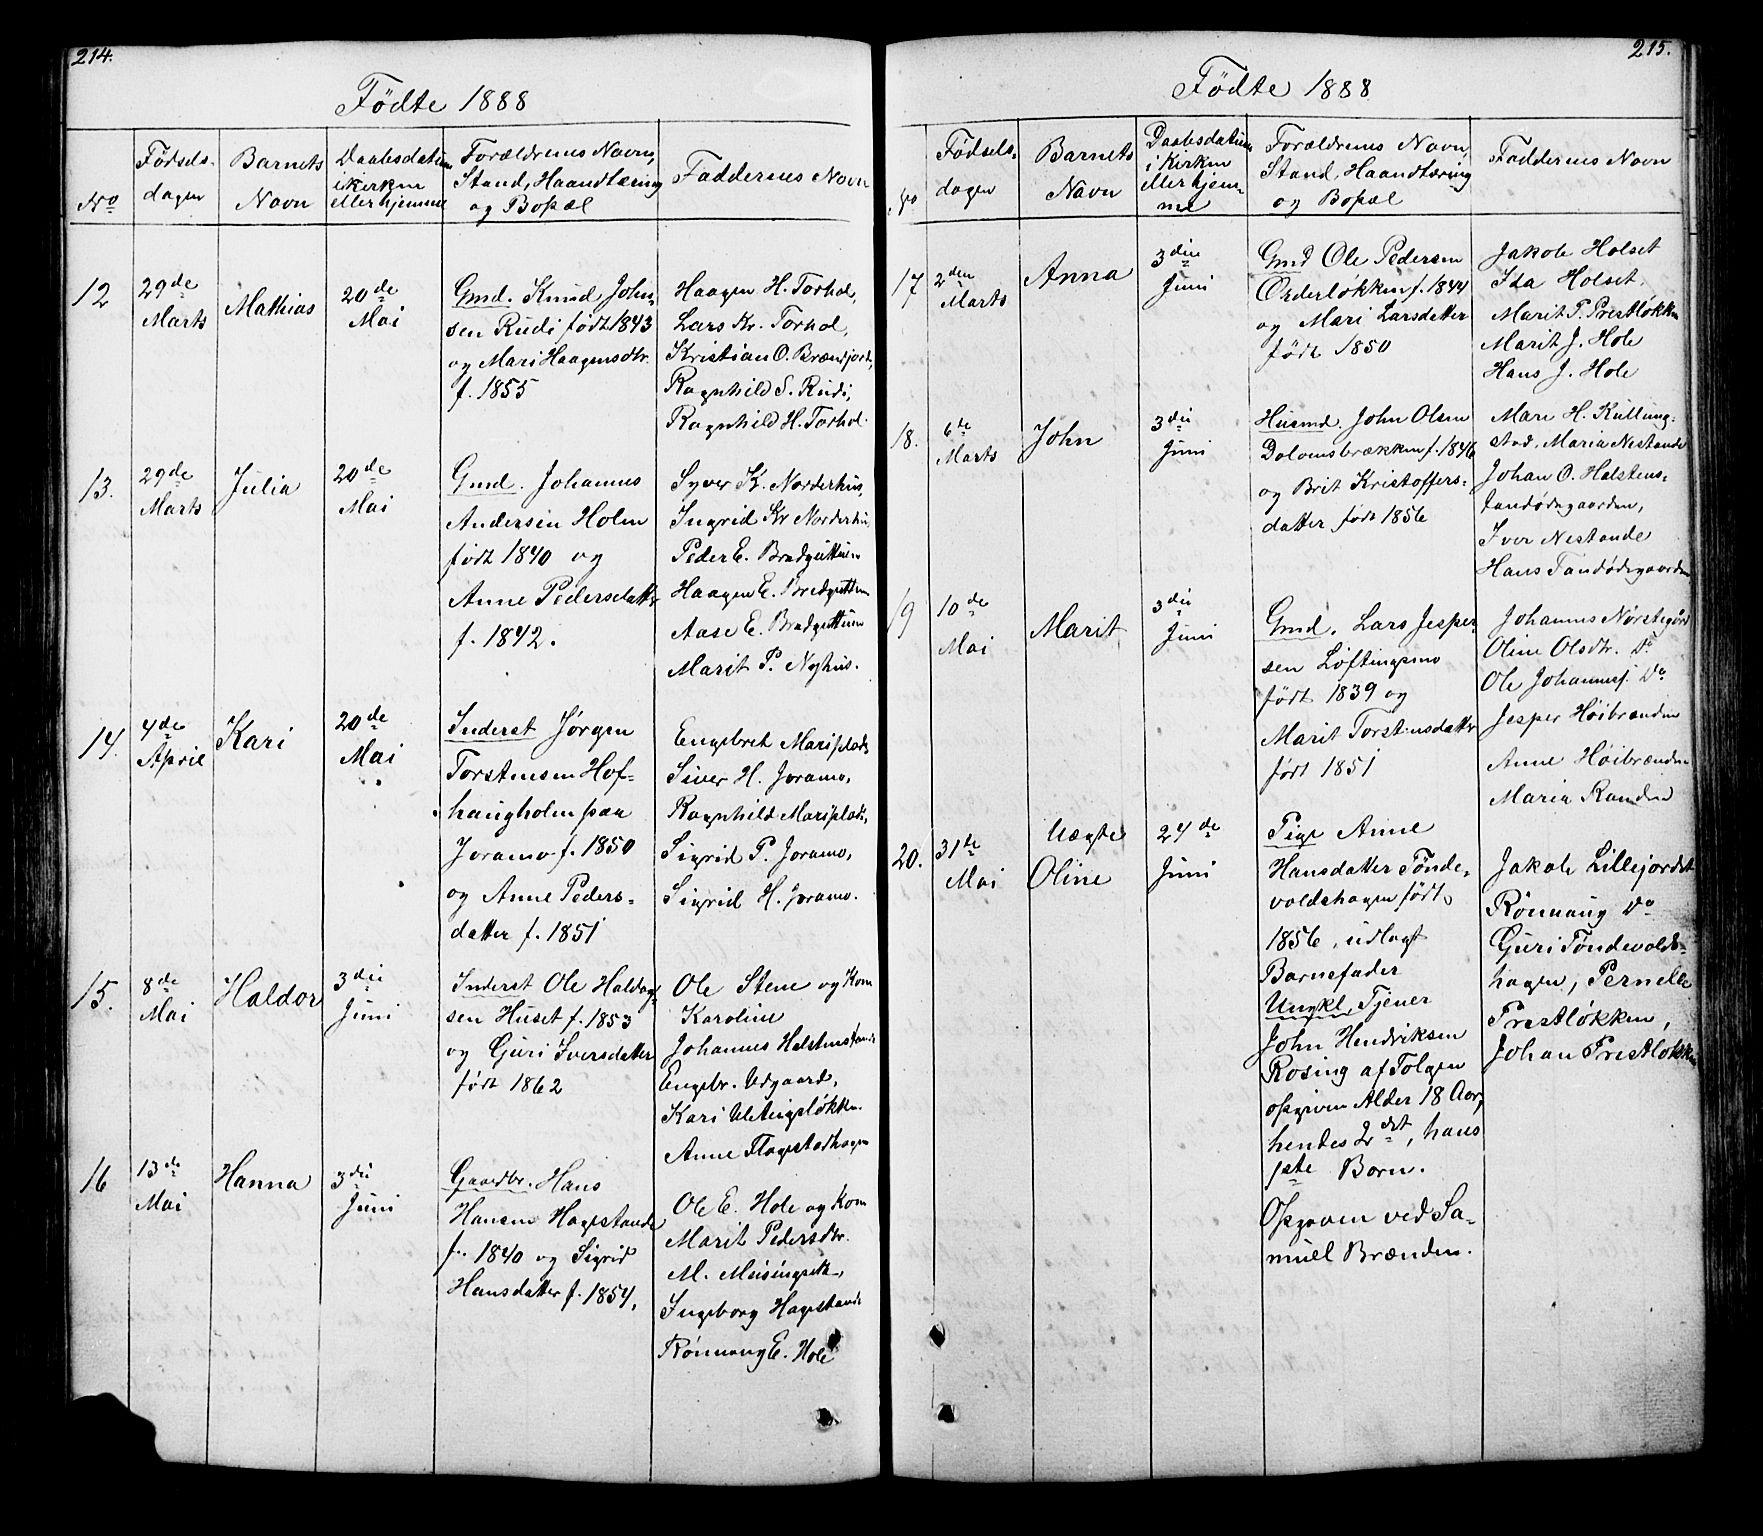 SAH, Lesja prestekontor, Klokkerbok nr. 5, 1850-1894, s. 214-215